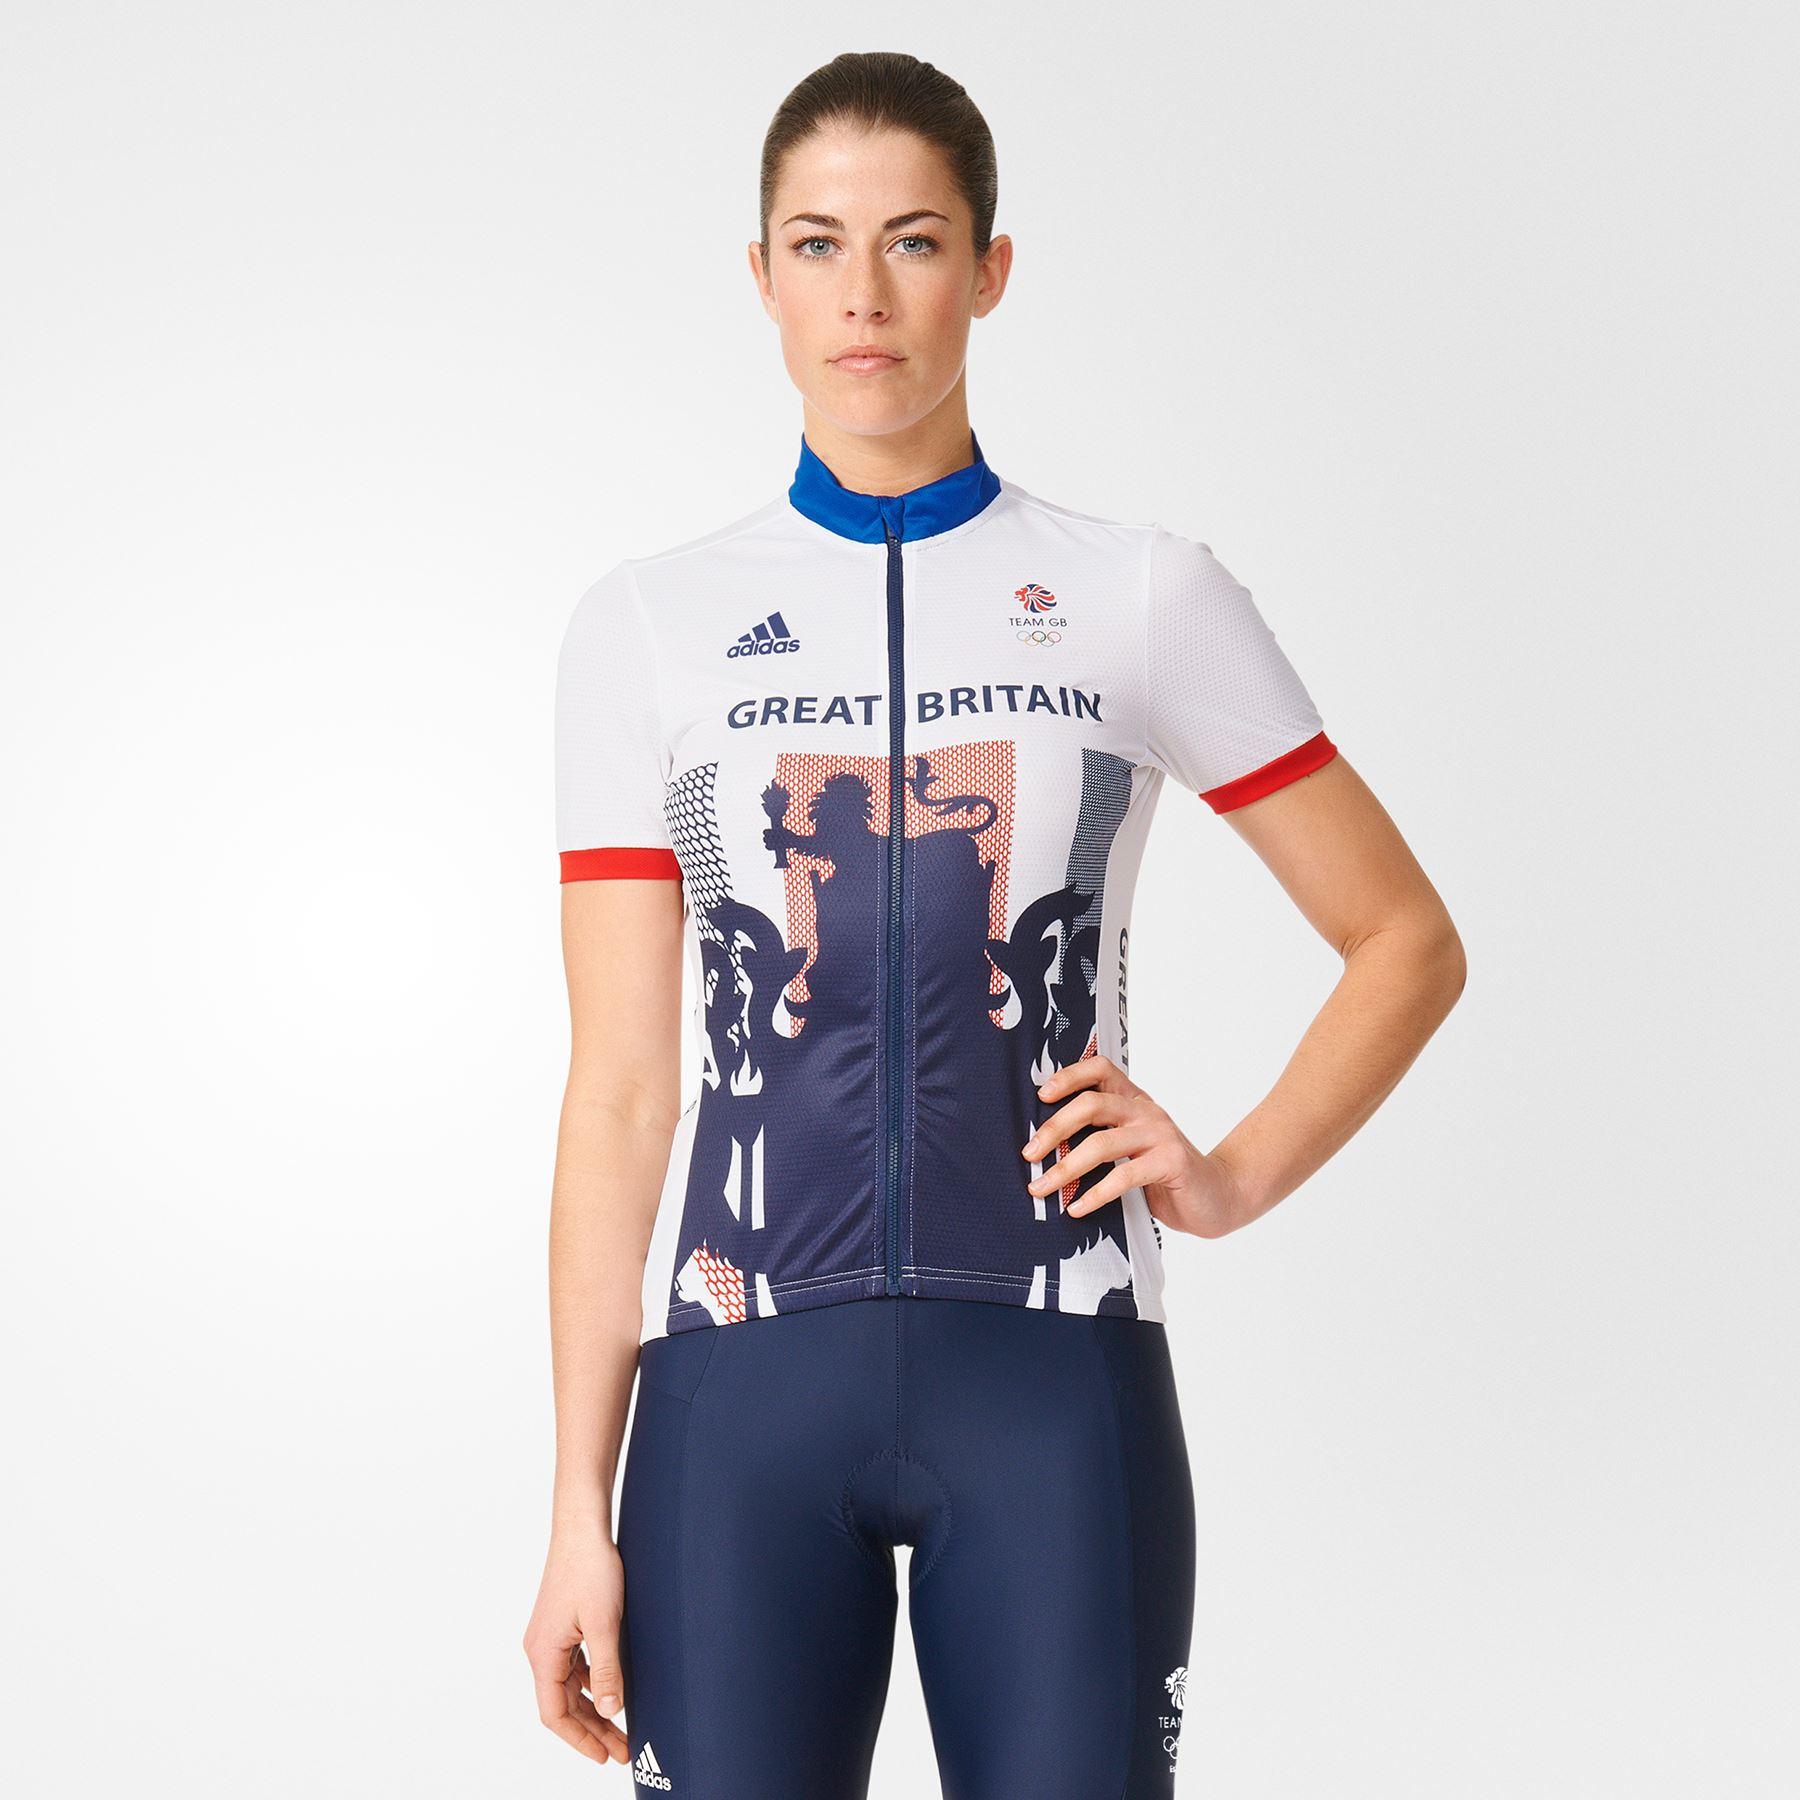 Adidas Womens Ladies Team Gb Replica Cycling Zip Up Jersey